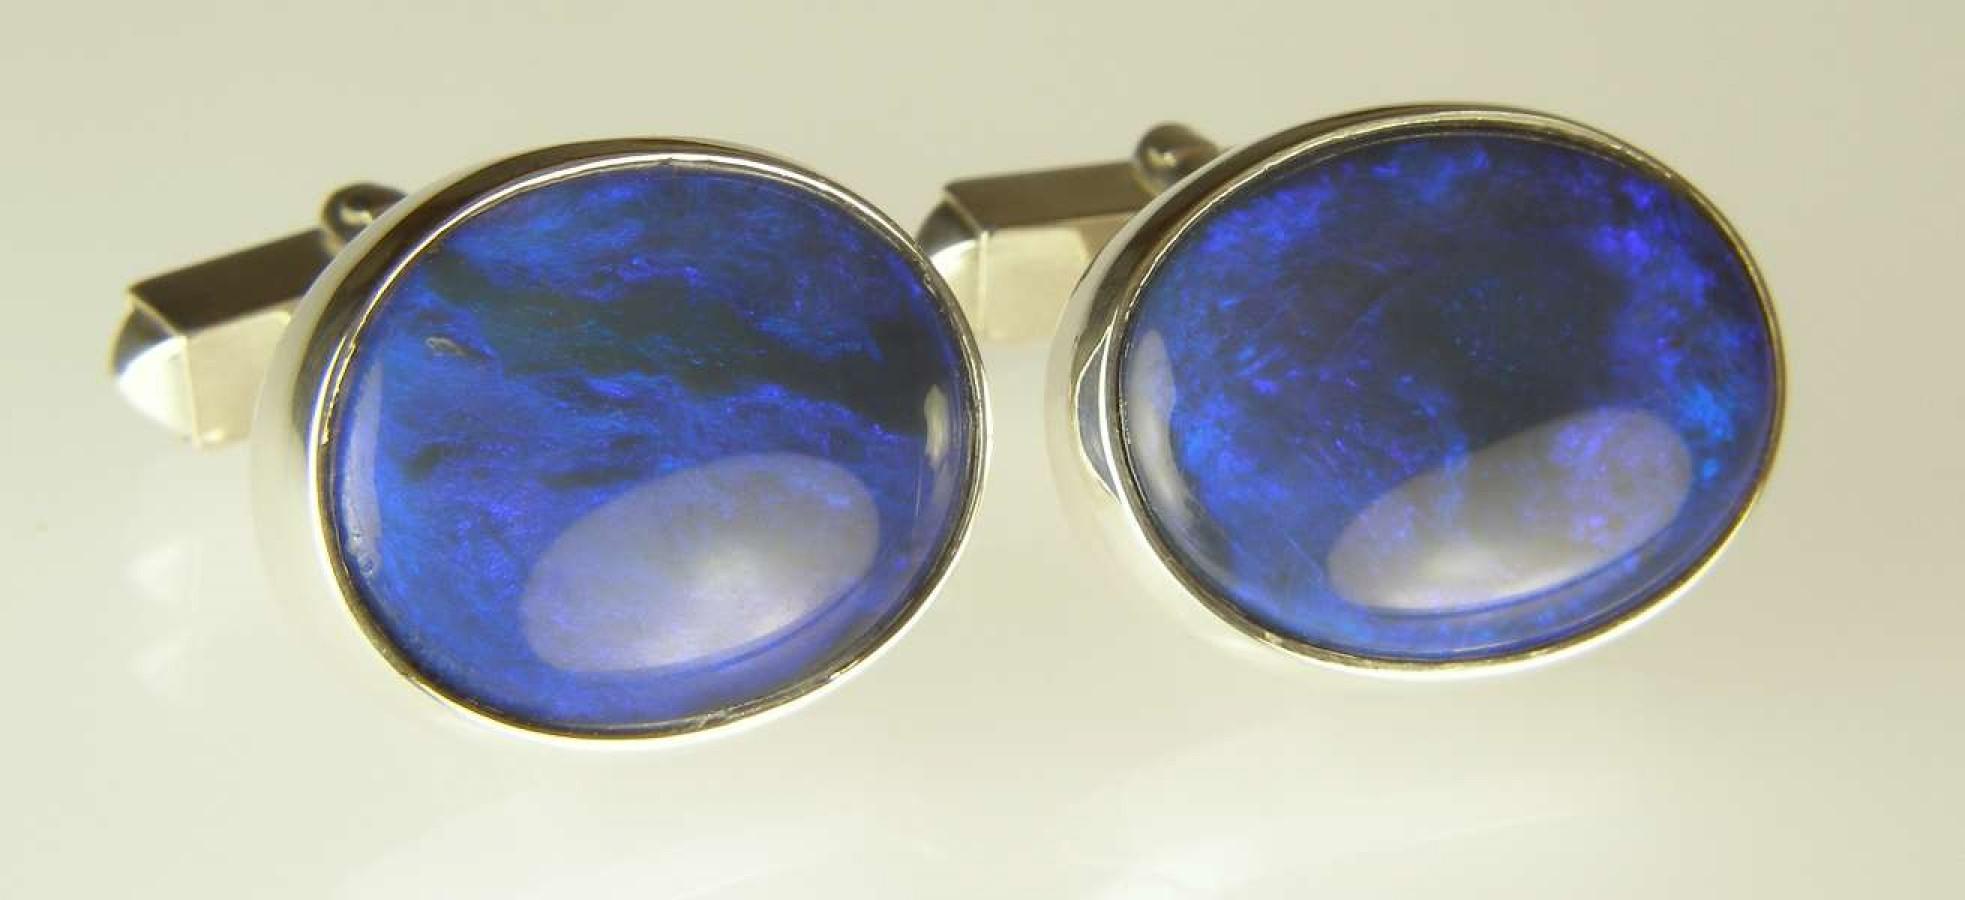 Black Opal Cufflinks 163 1 250